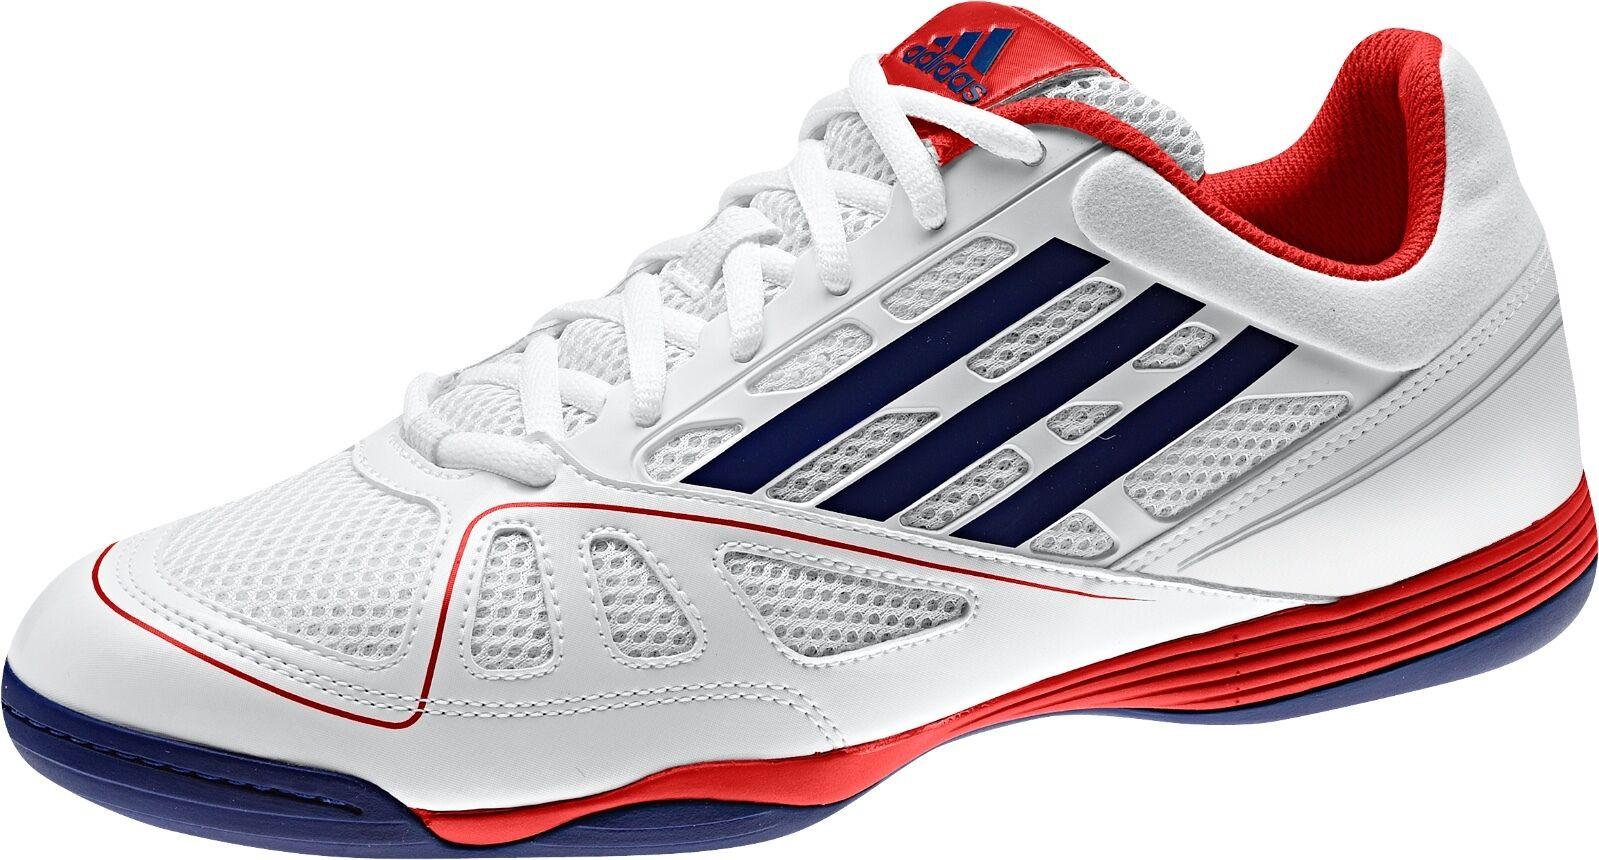 Adidas TT30 TT30 TT30 TT-Schuh   NEU+OVP c5c98e